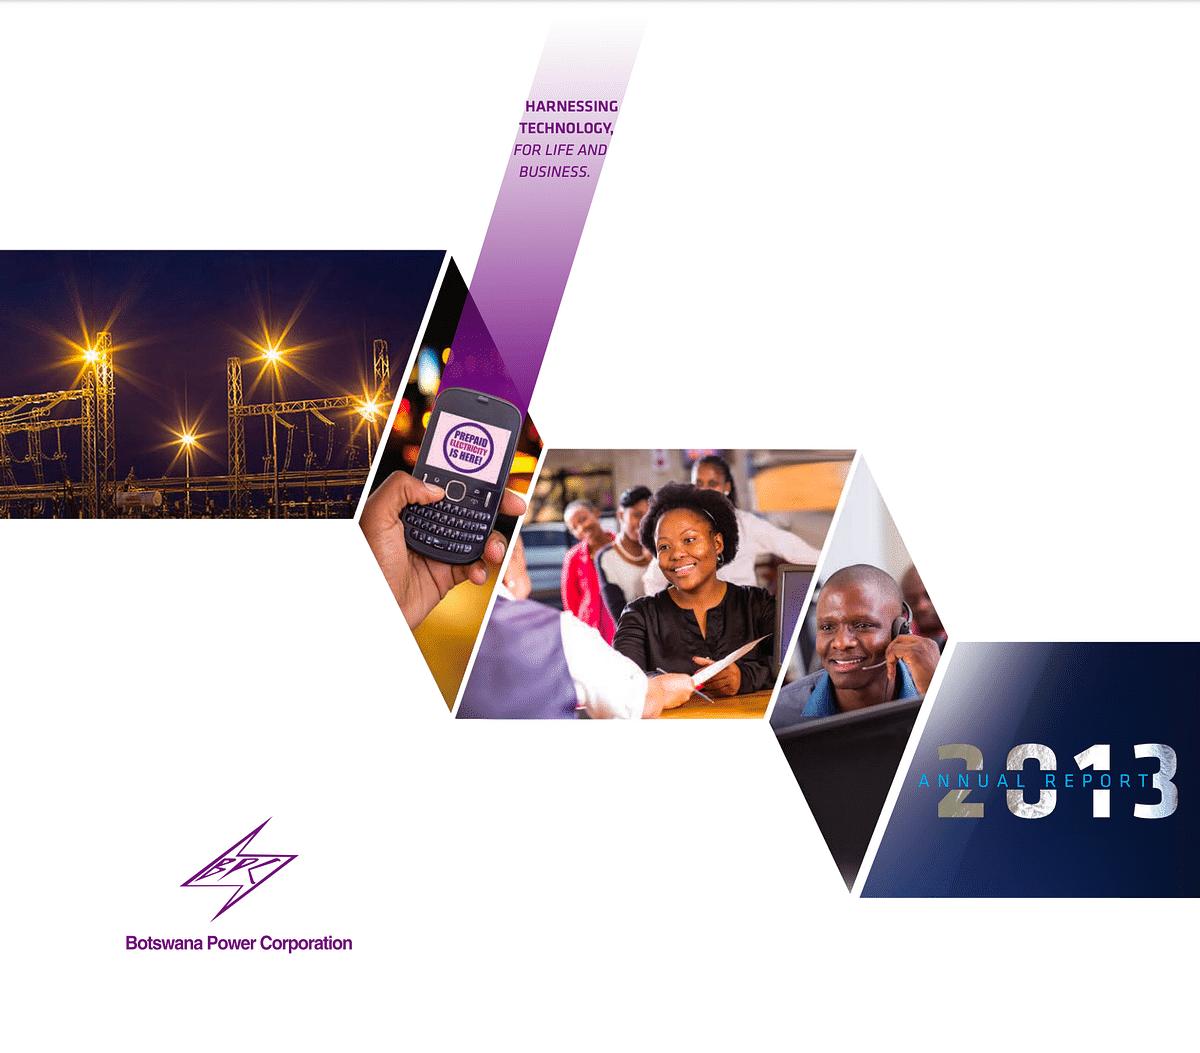 BPC Annual Report 2013 cover